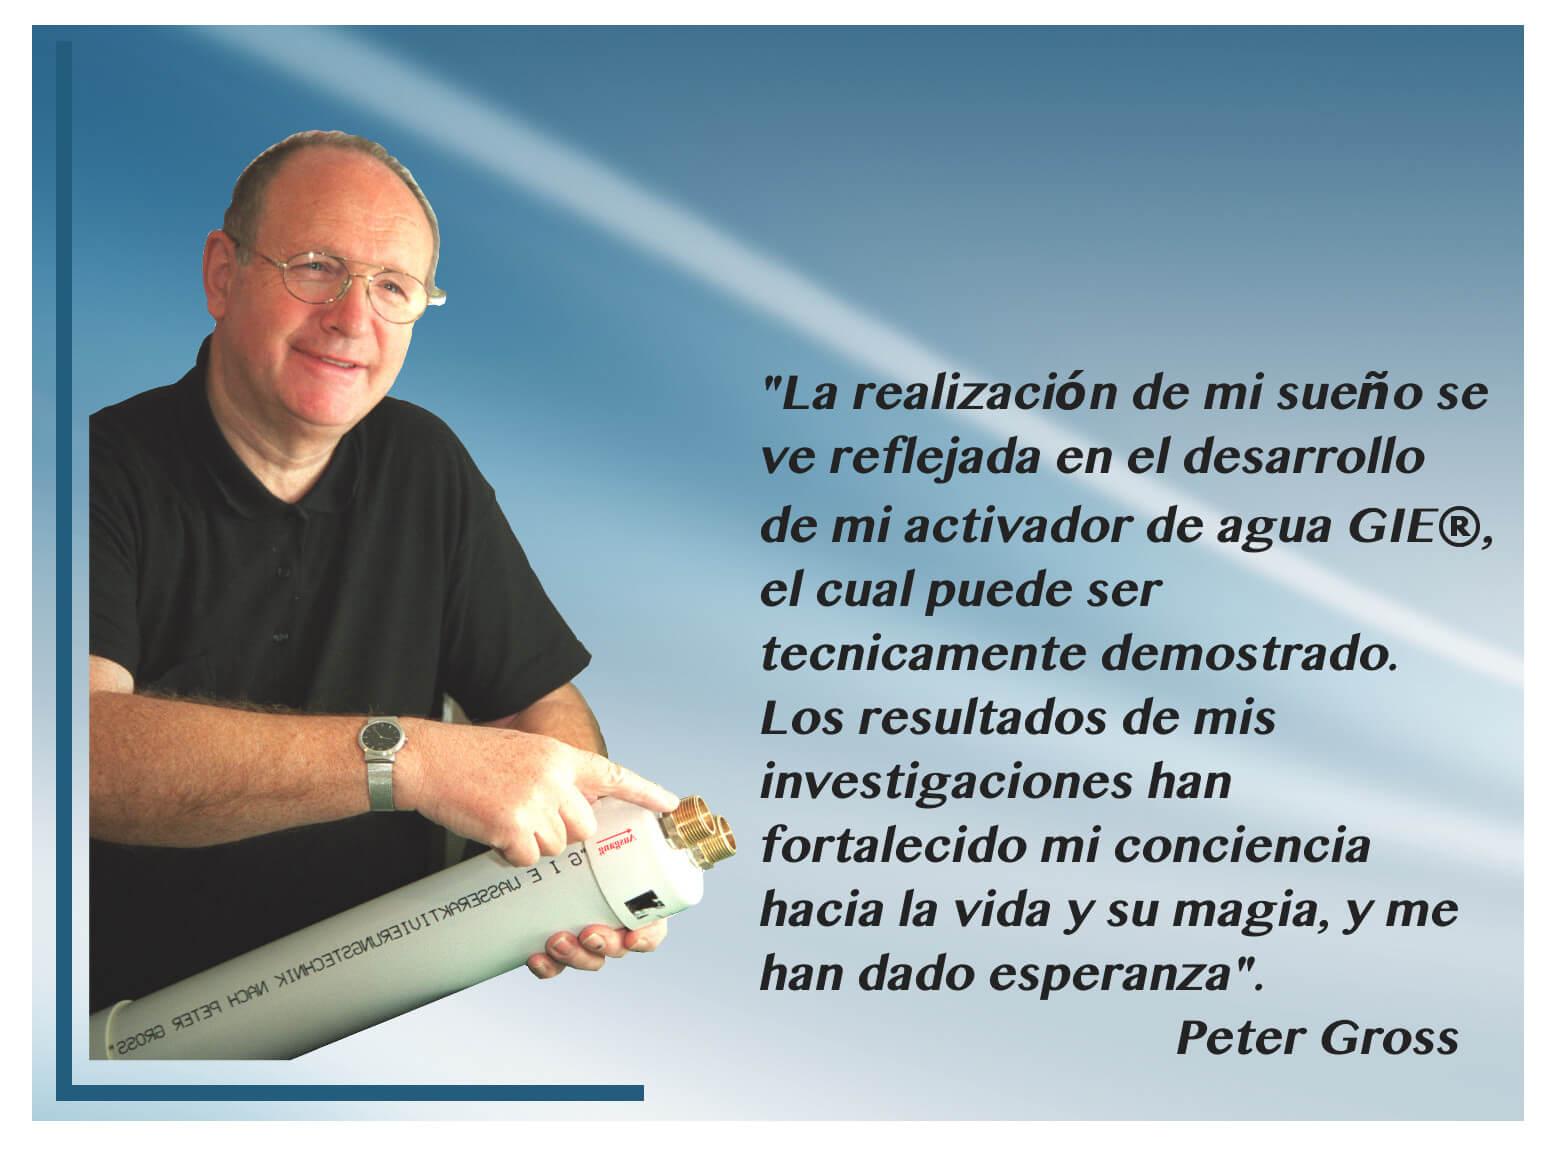 vitalizacion-del-agua-Peter-Gross